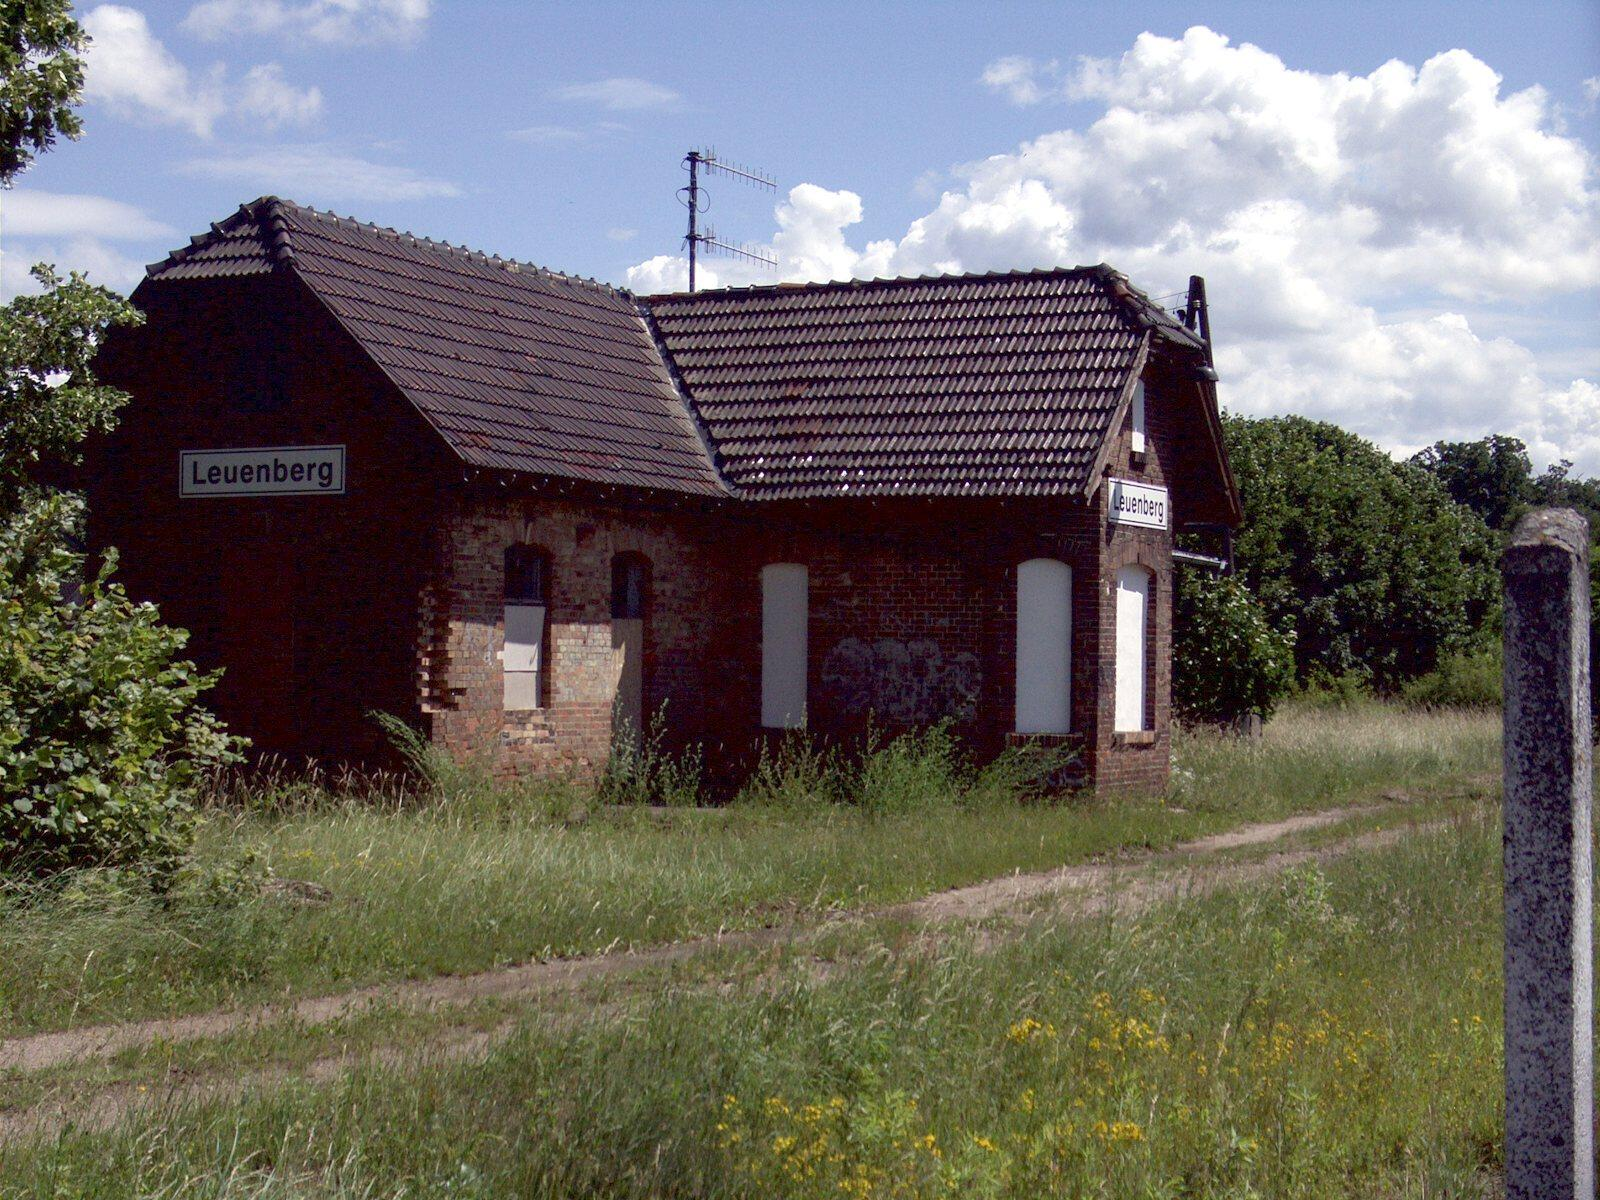 Leuenberg Bahnhof